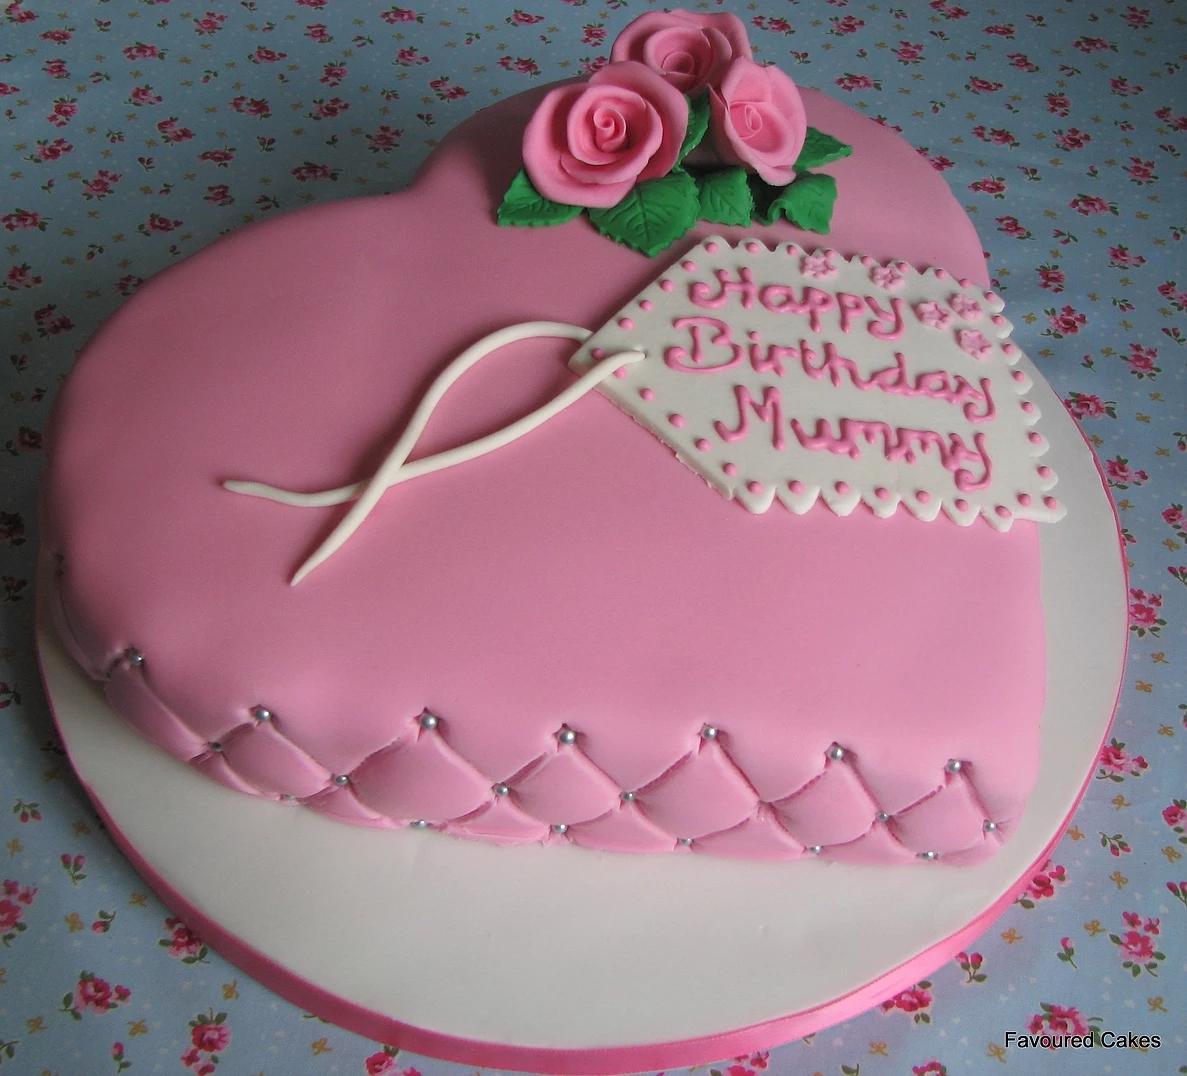 Heart & Large Diamond Studded Cake